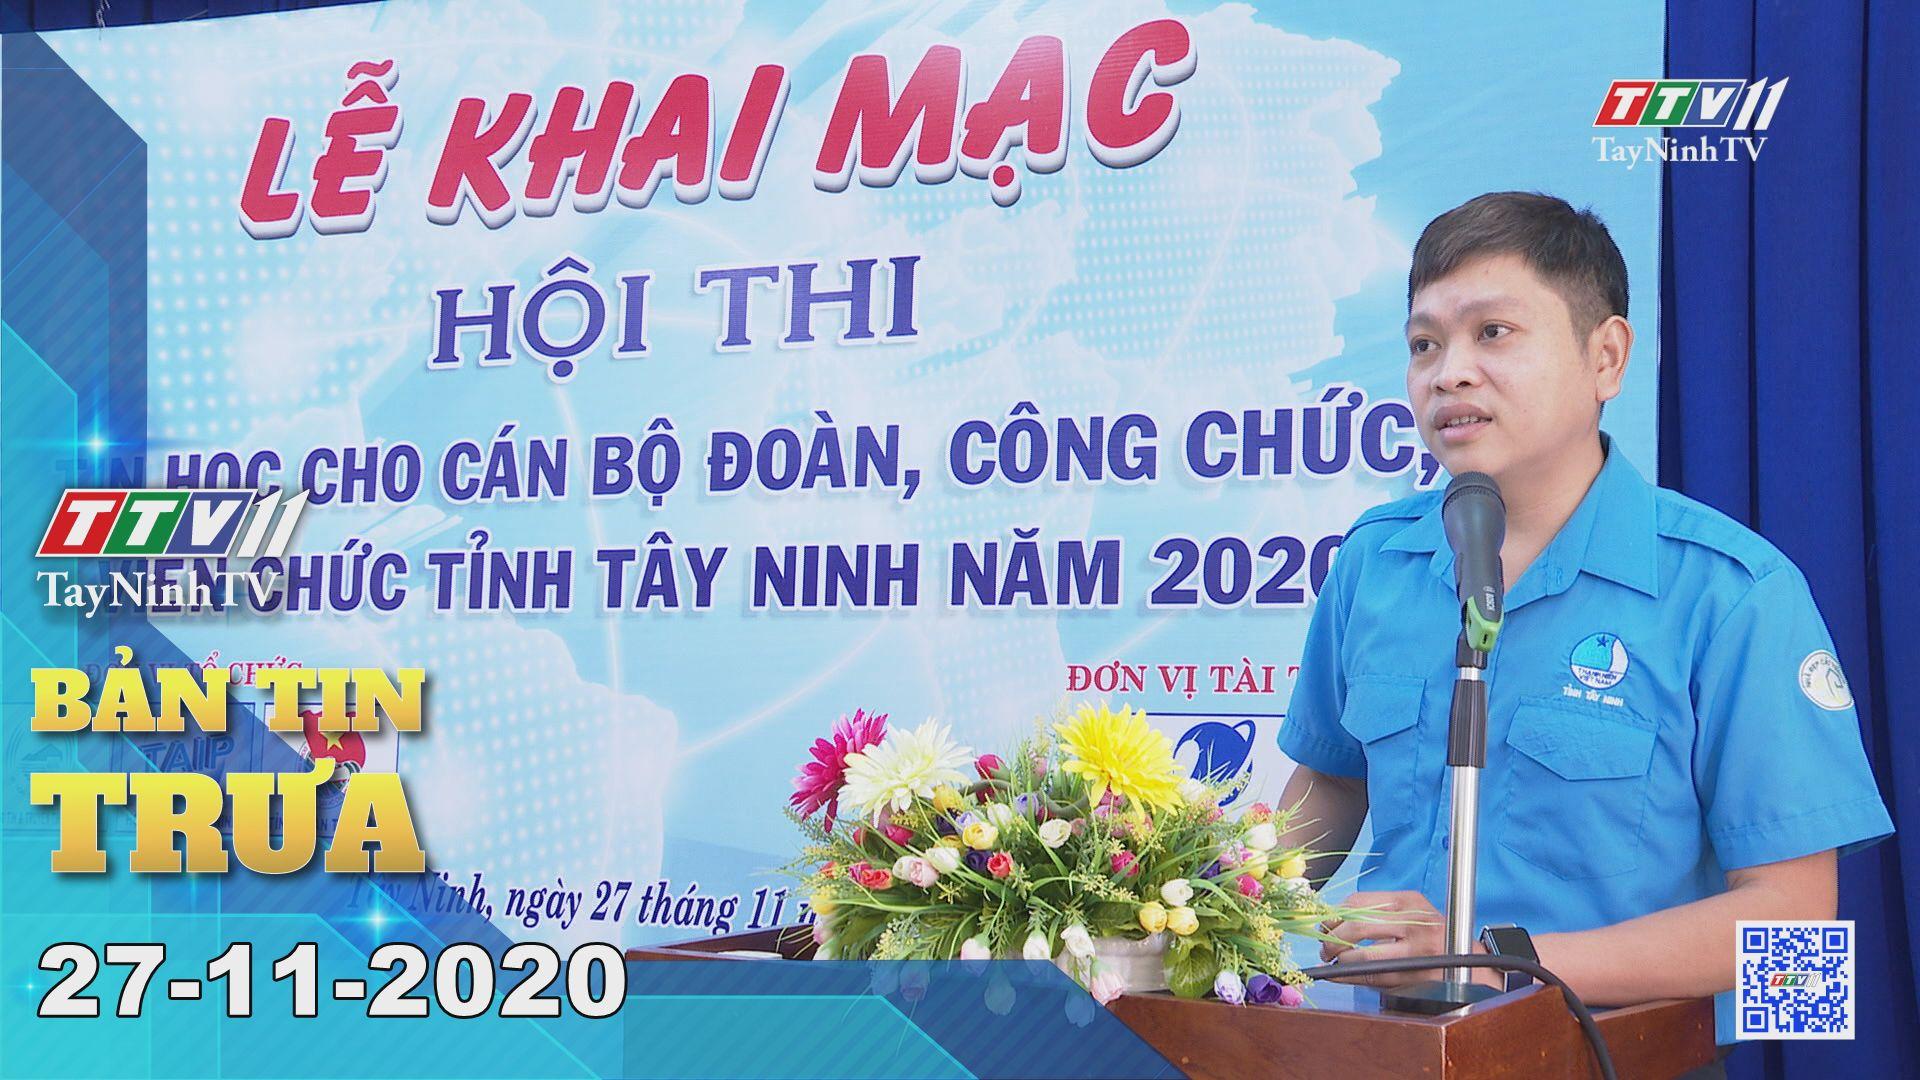 Bản tin trưa 27-11-2020 | Tin tức hôm nay | TayNinhTV